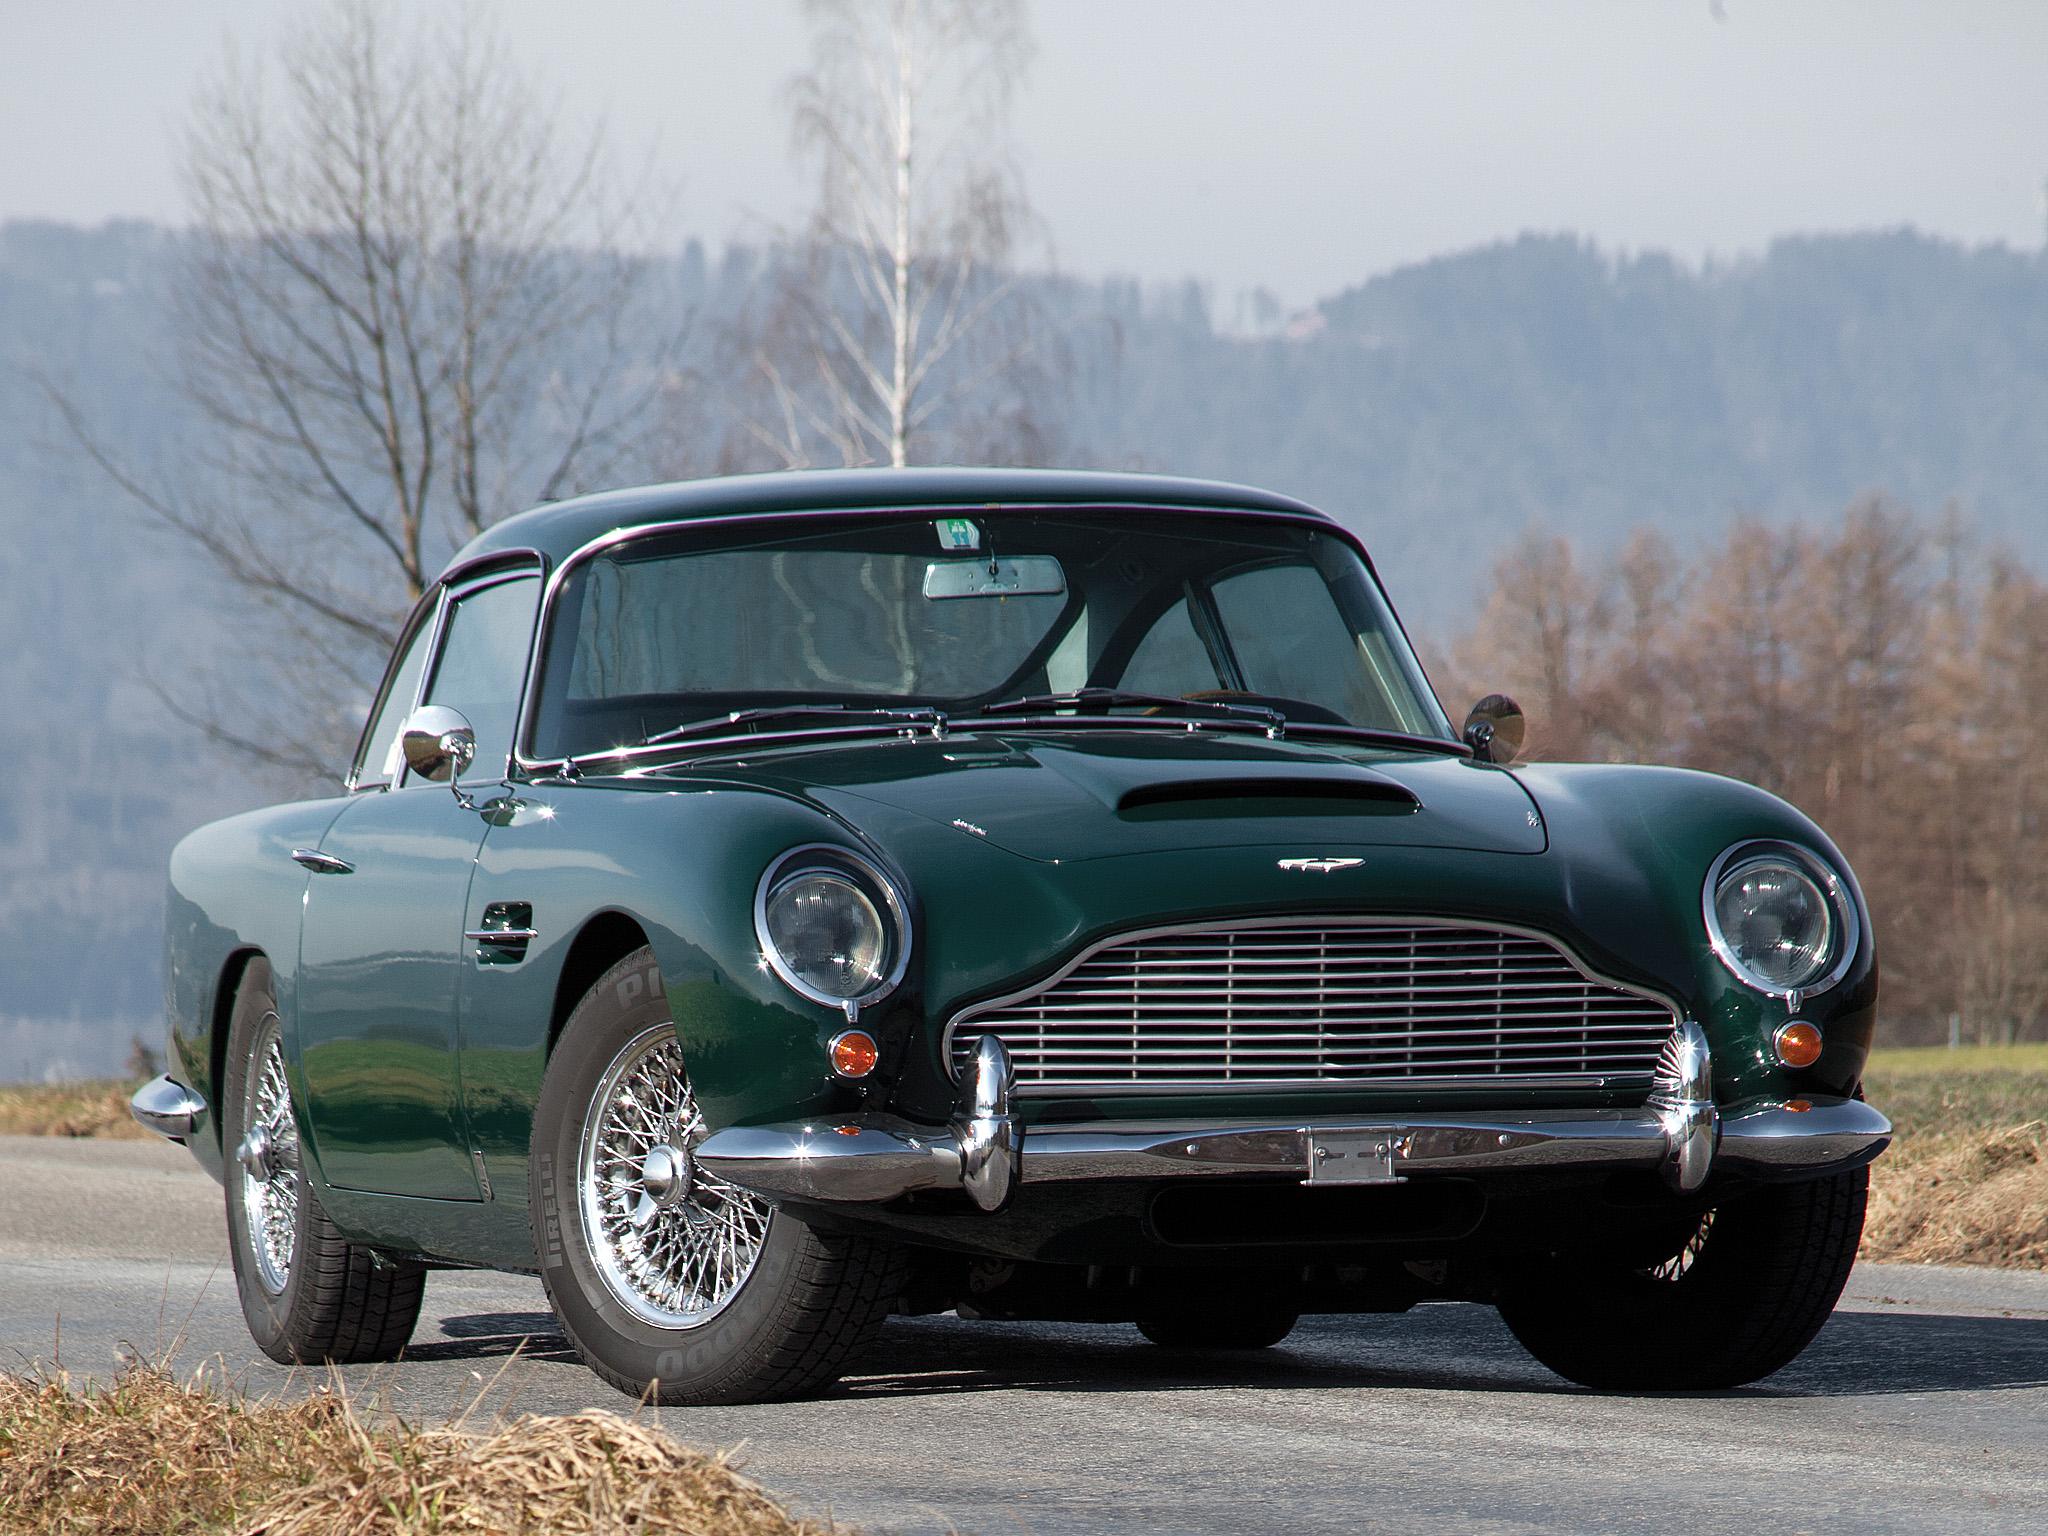 Aston Martin DB5 wallpaper 4 2048x1536